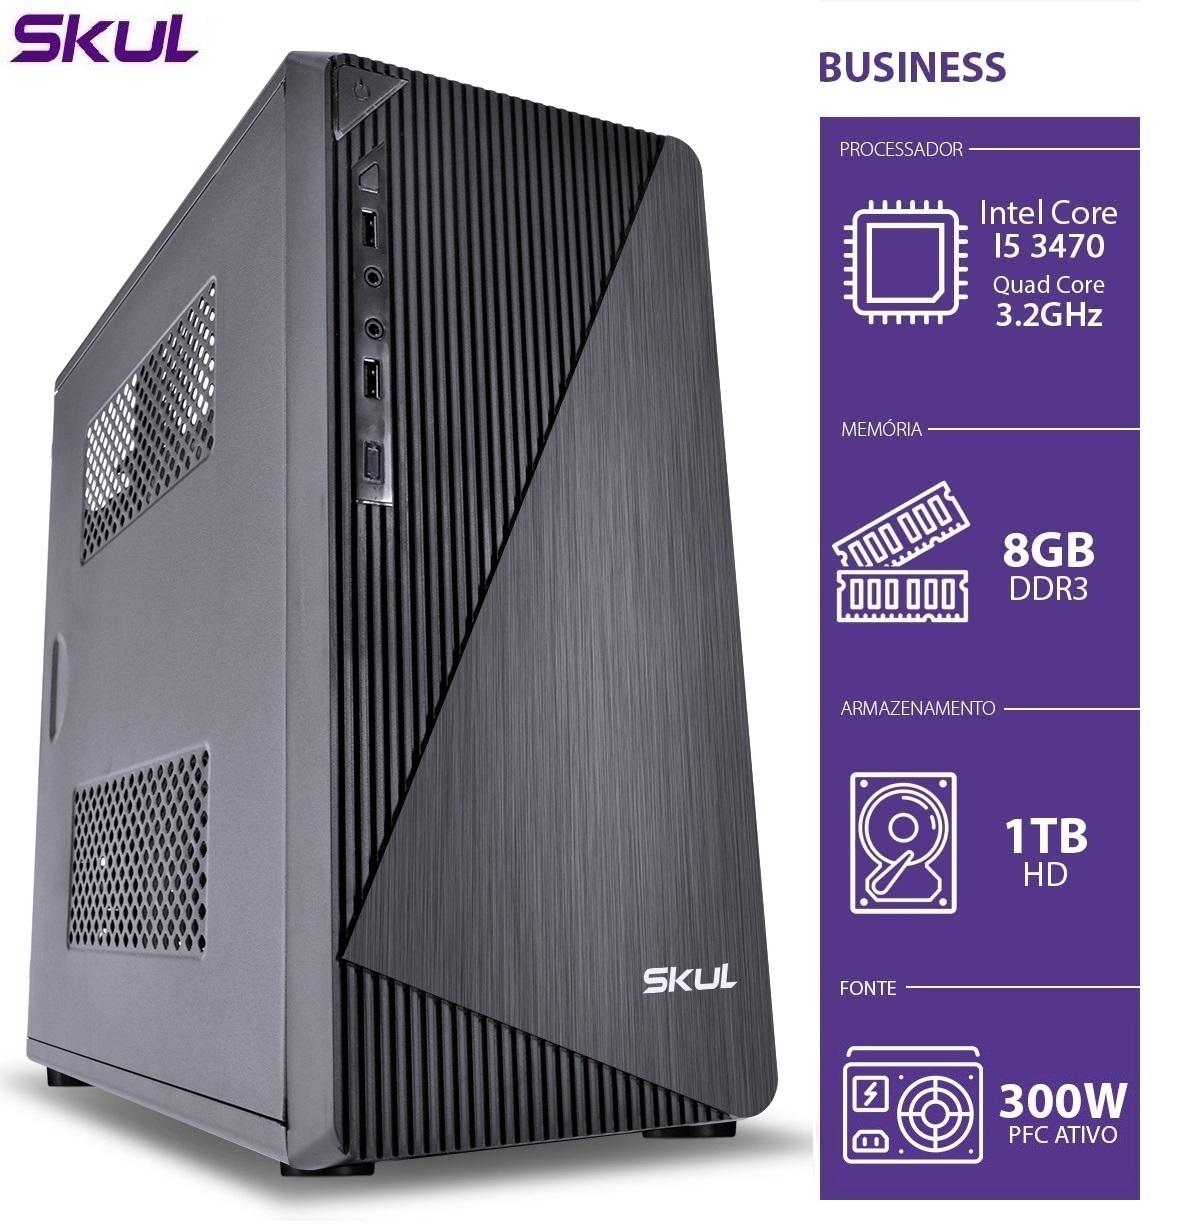 COMPUTADOR BUSINESS B500 - I5 3470 3.2GHZ 3ªGER MEM 8GB DDR3 HD 1TB HDMI/VGA FONTE 300W  - Audio Video & cia